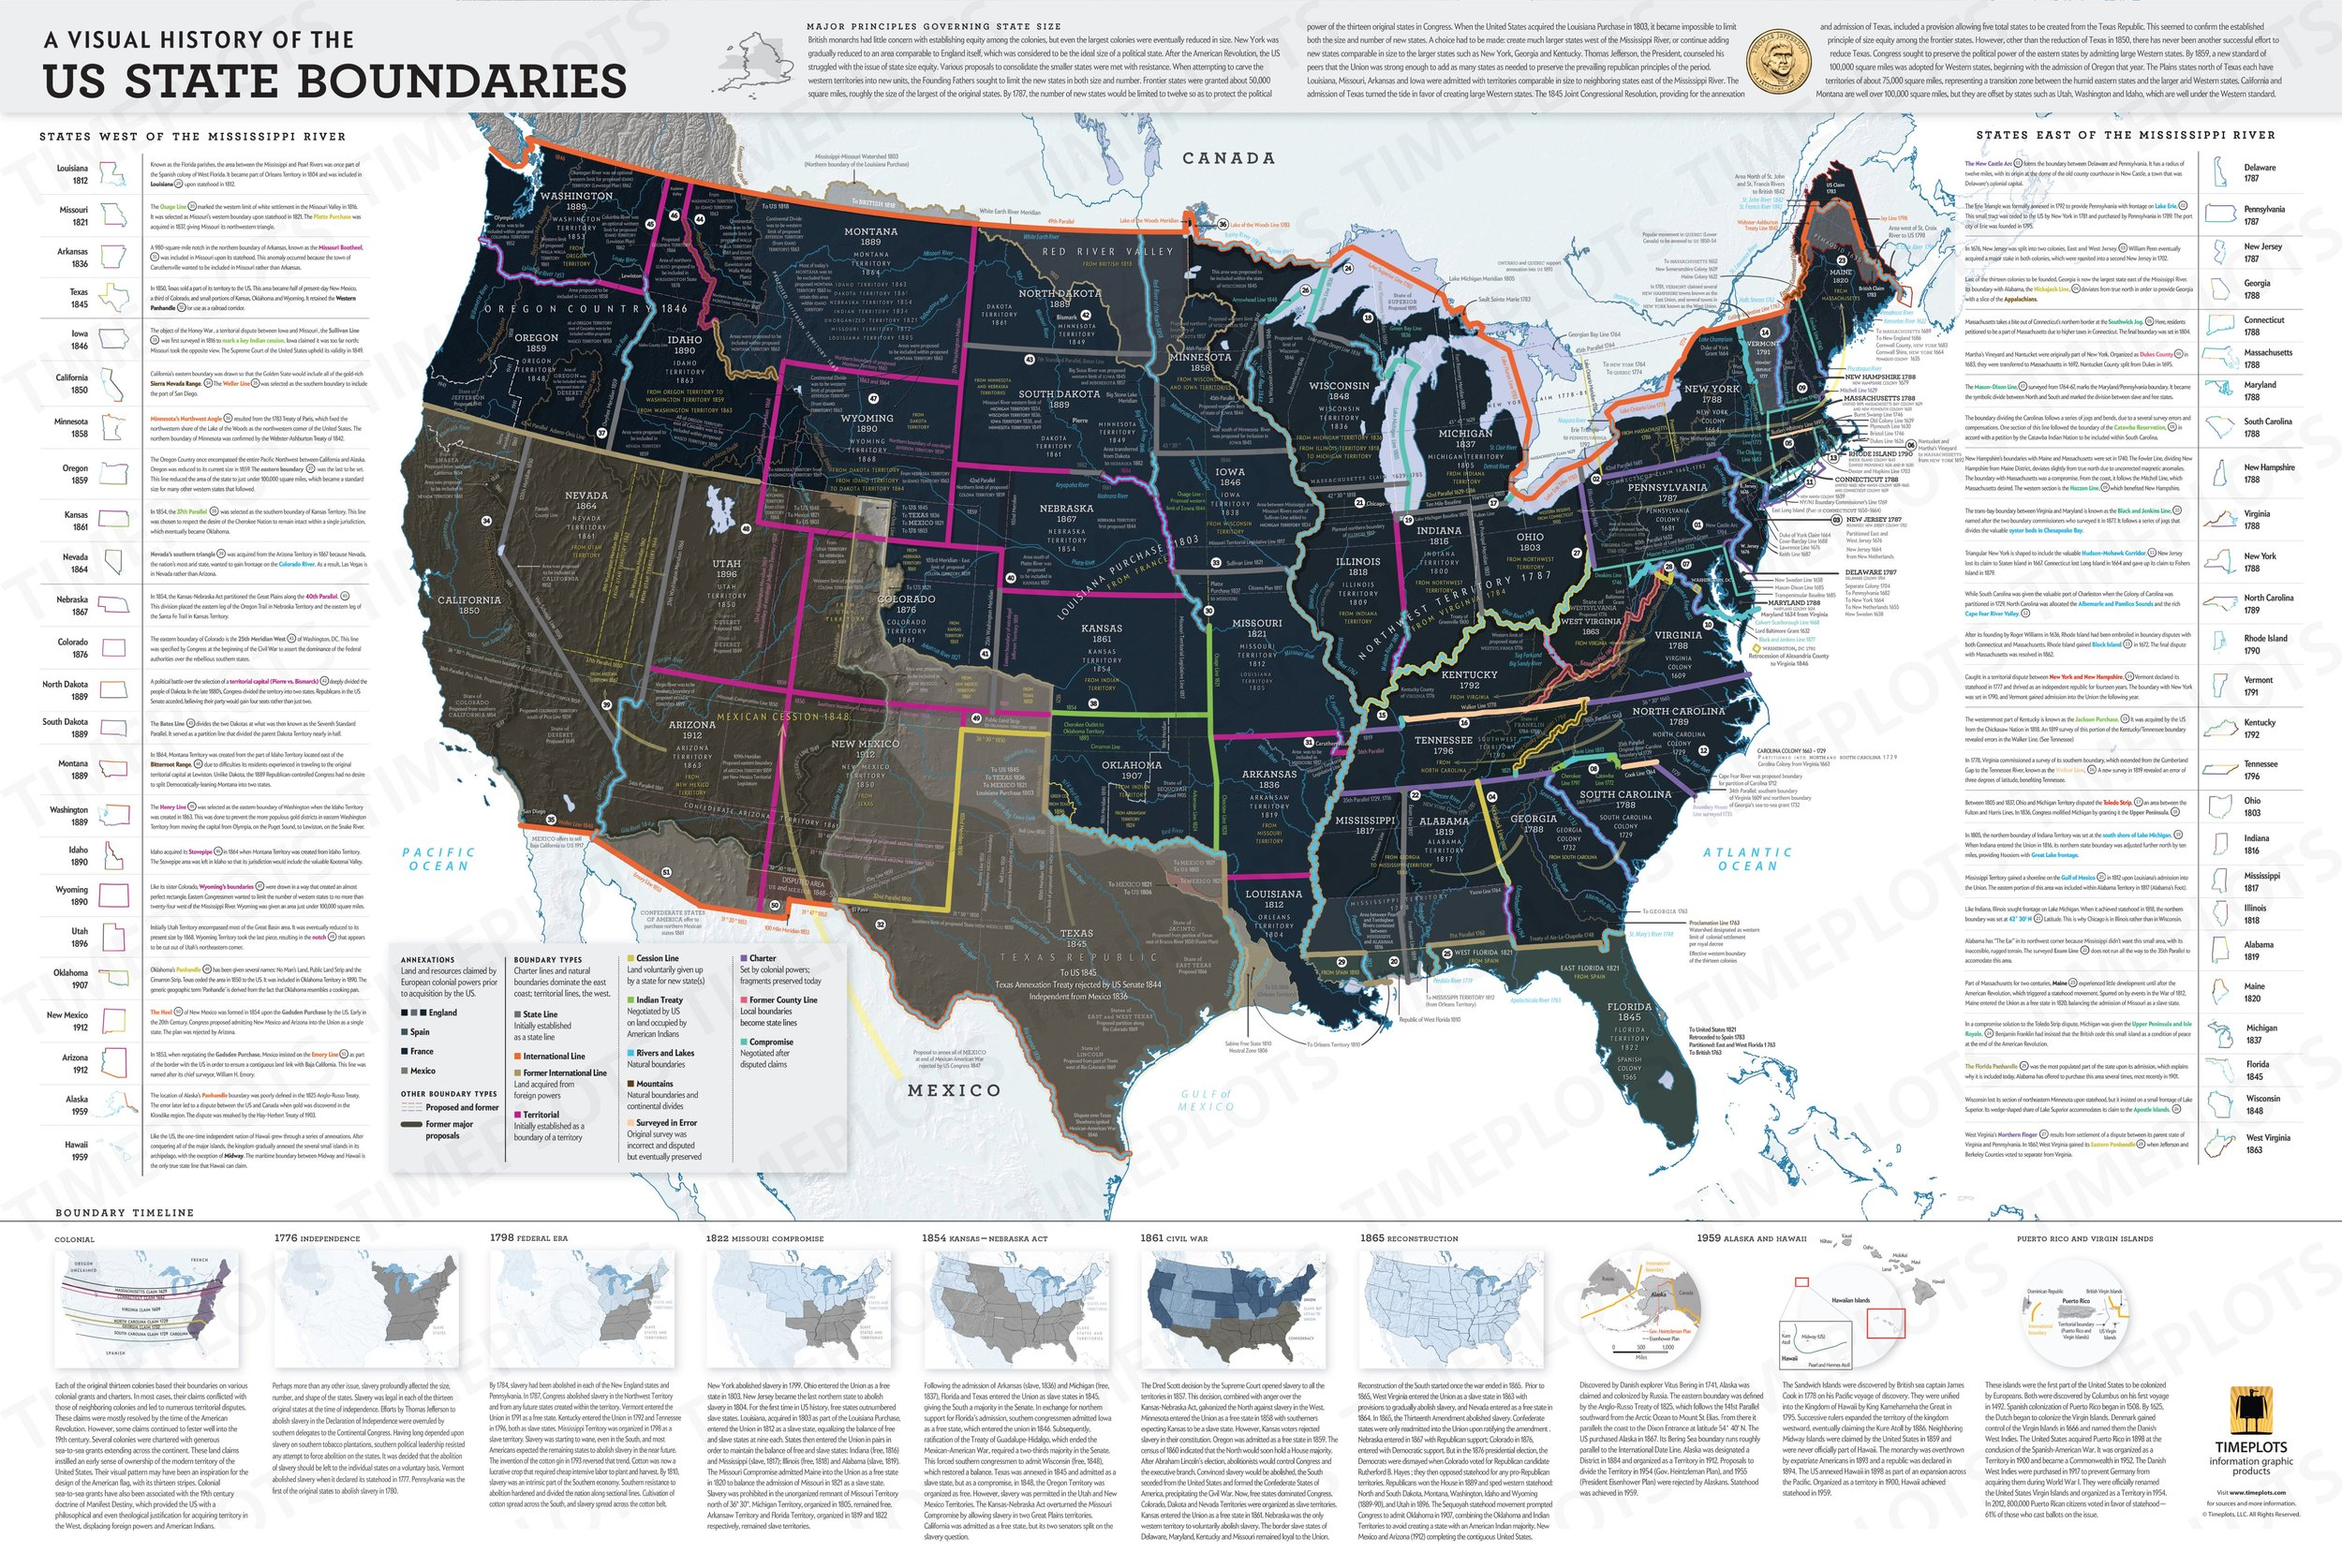 A Visual History of U.S. State Boundaries